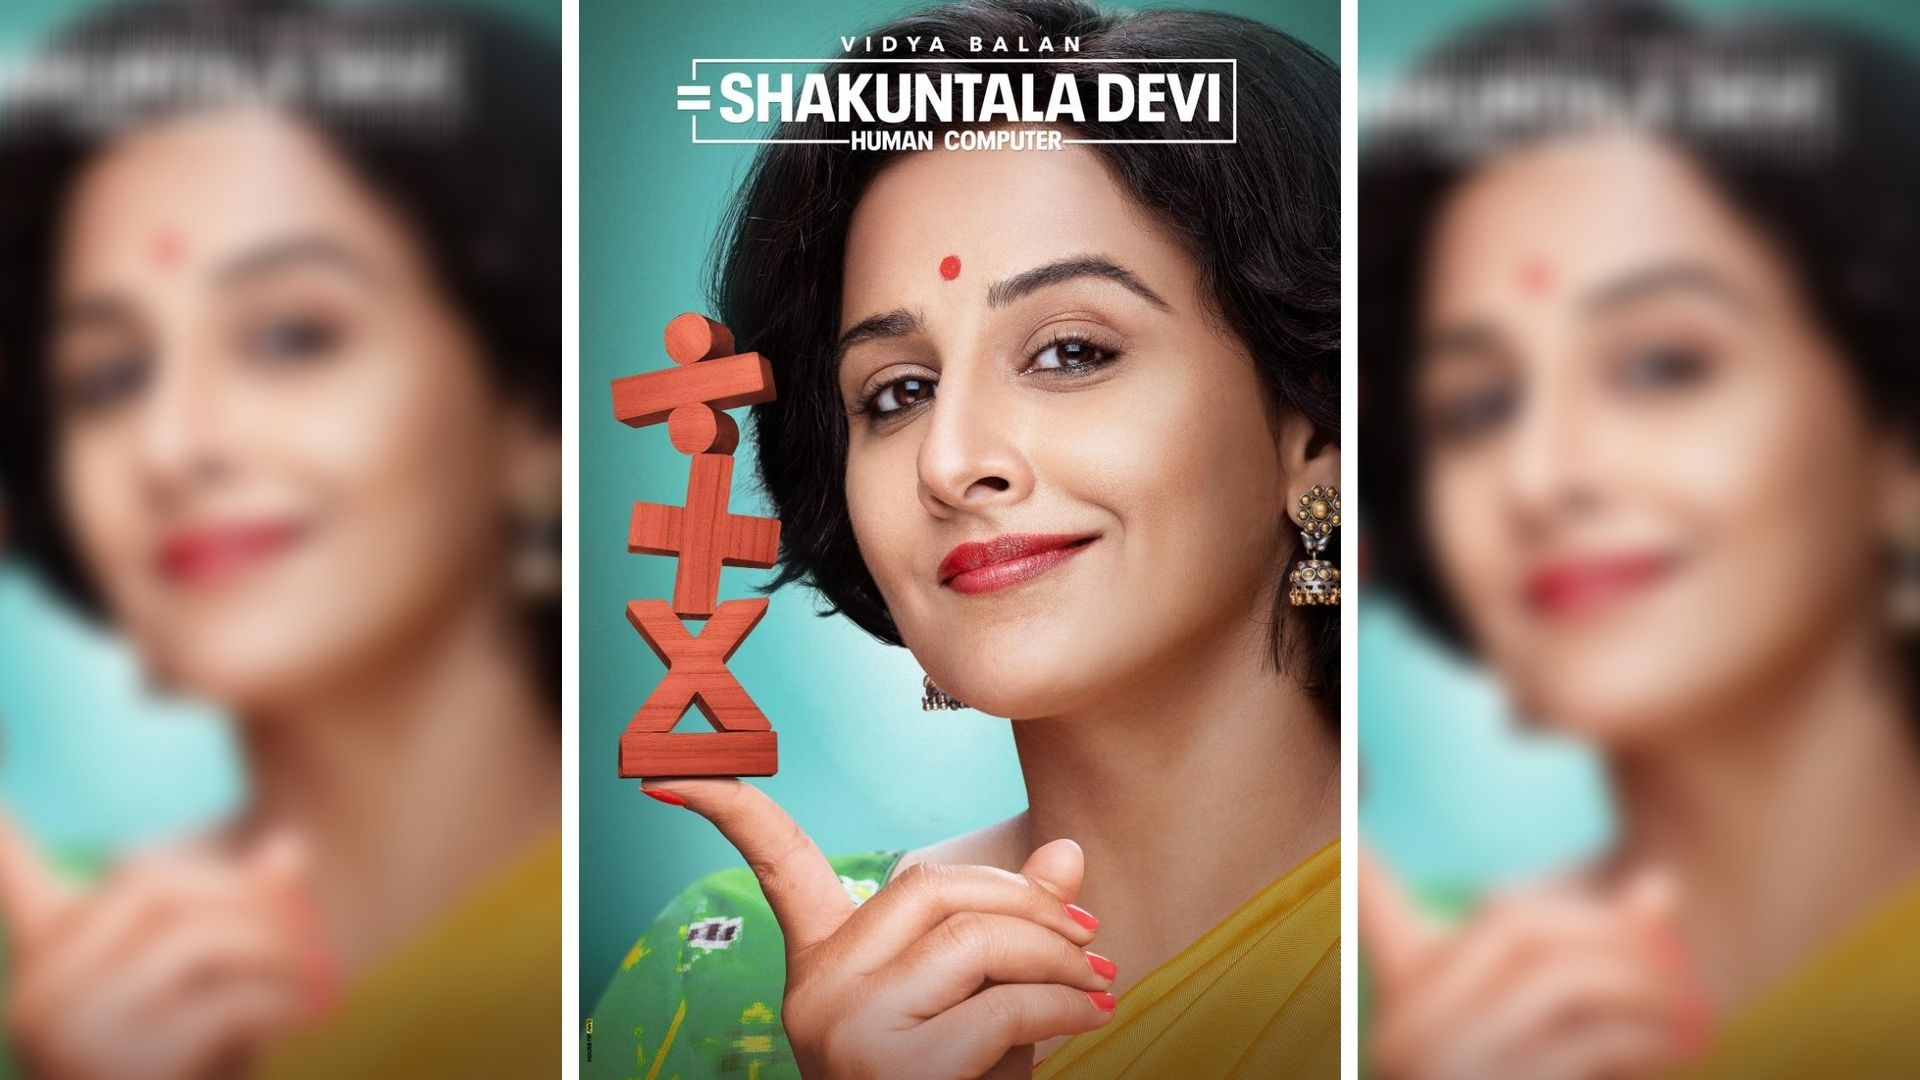 On World Mathematics Day, Vidya Shares Poster of 'Shakuntala Devi'